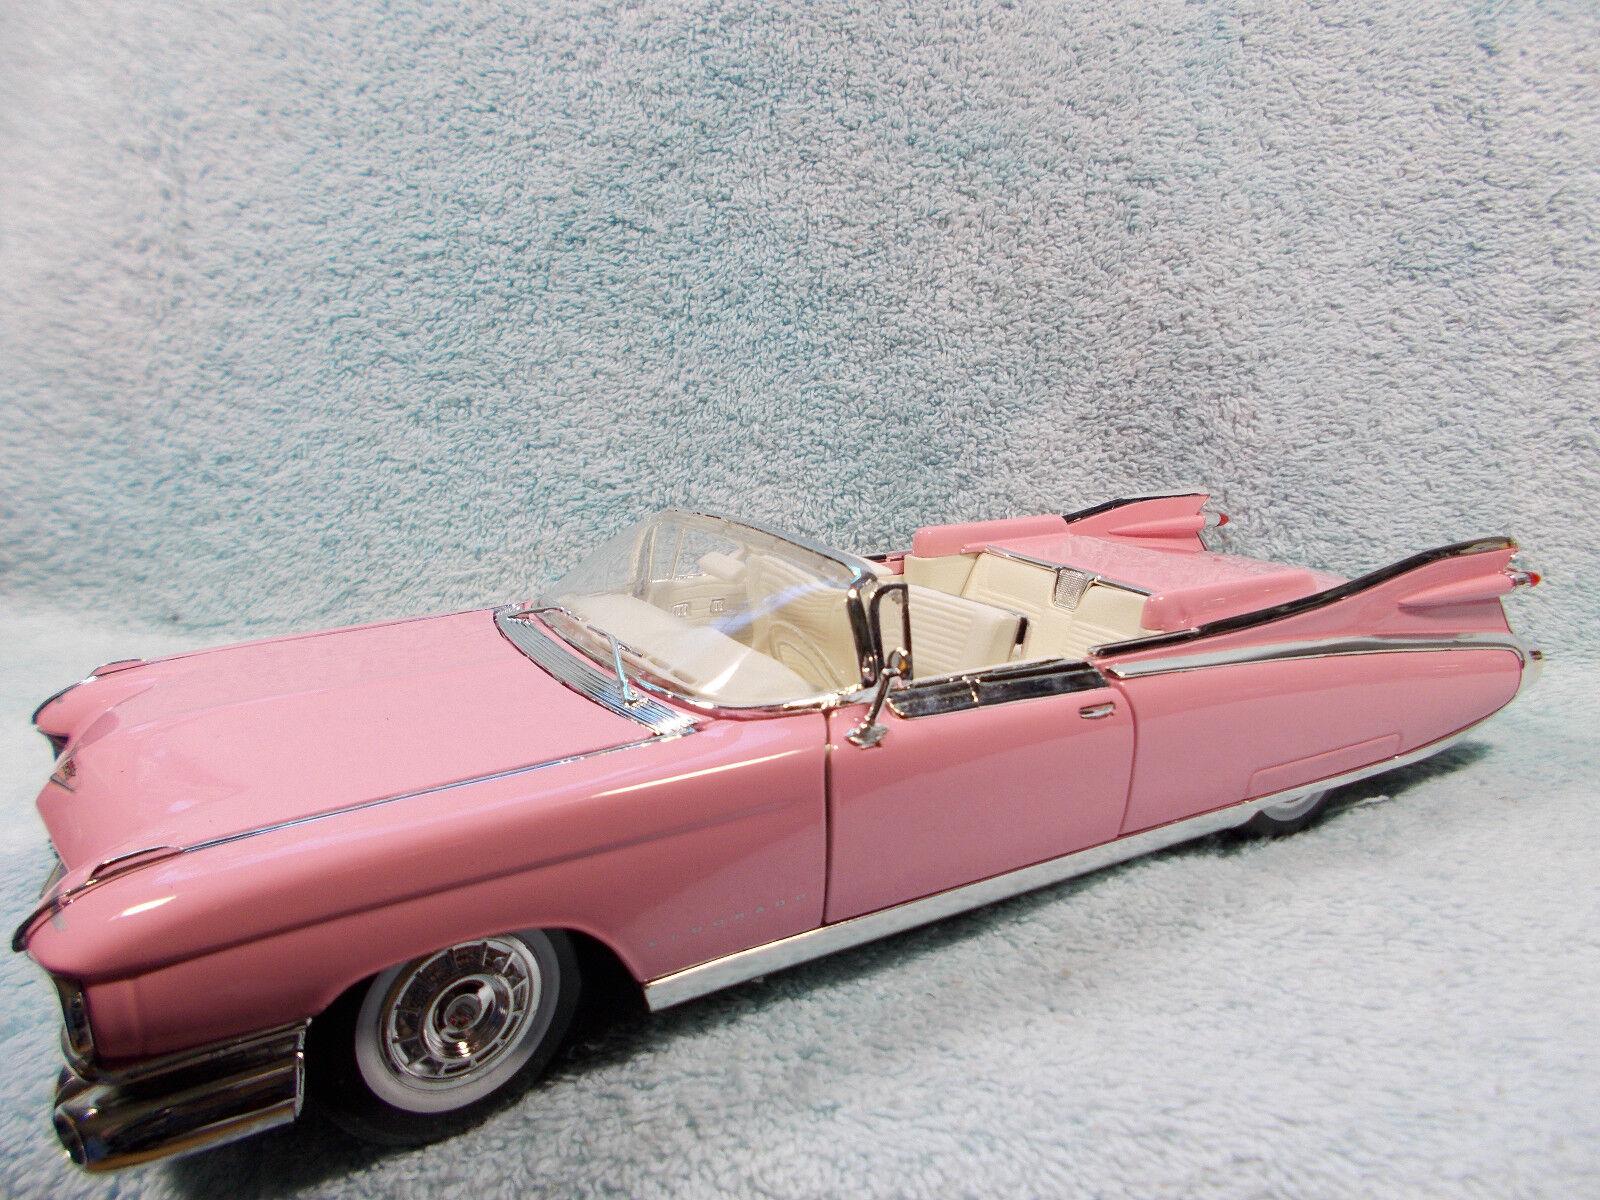 1 18 SCALE DIECAST 1959 CADILLAC ELDORADO BARITZ CABRIOLET IN PINK BY MAISTO.